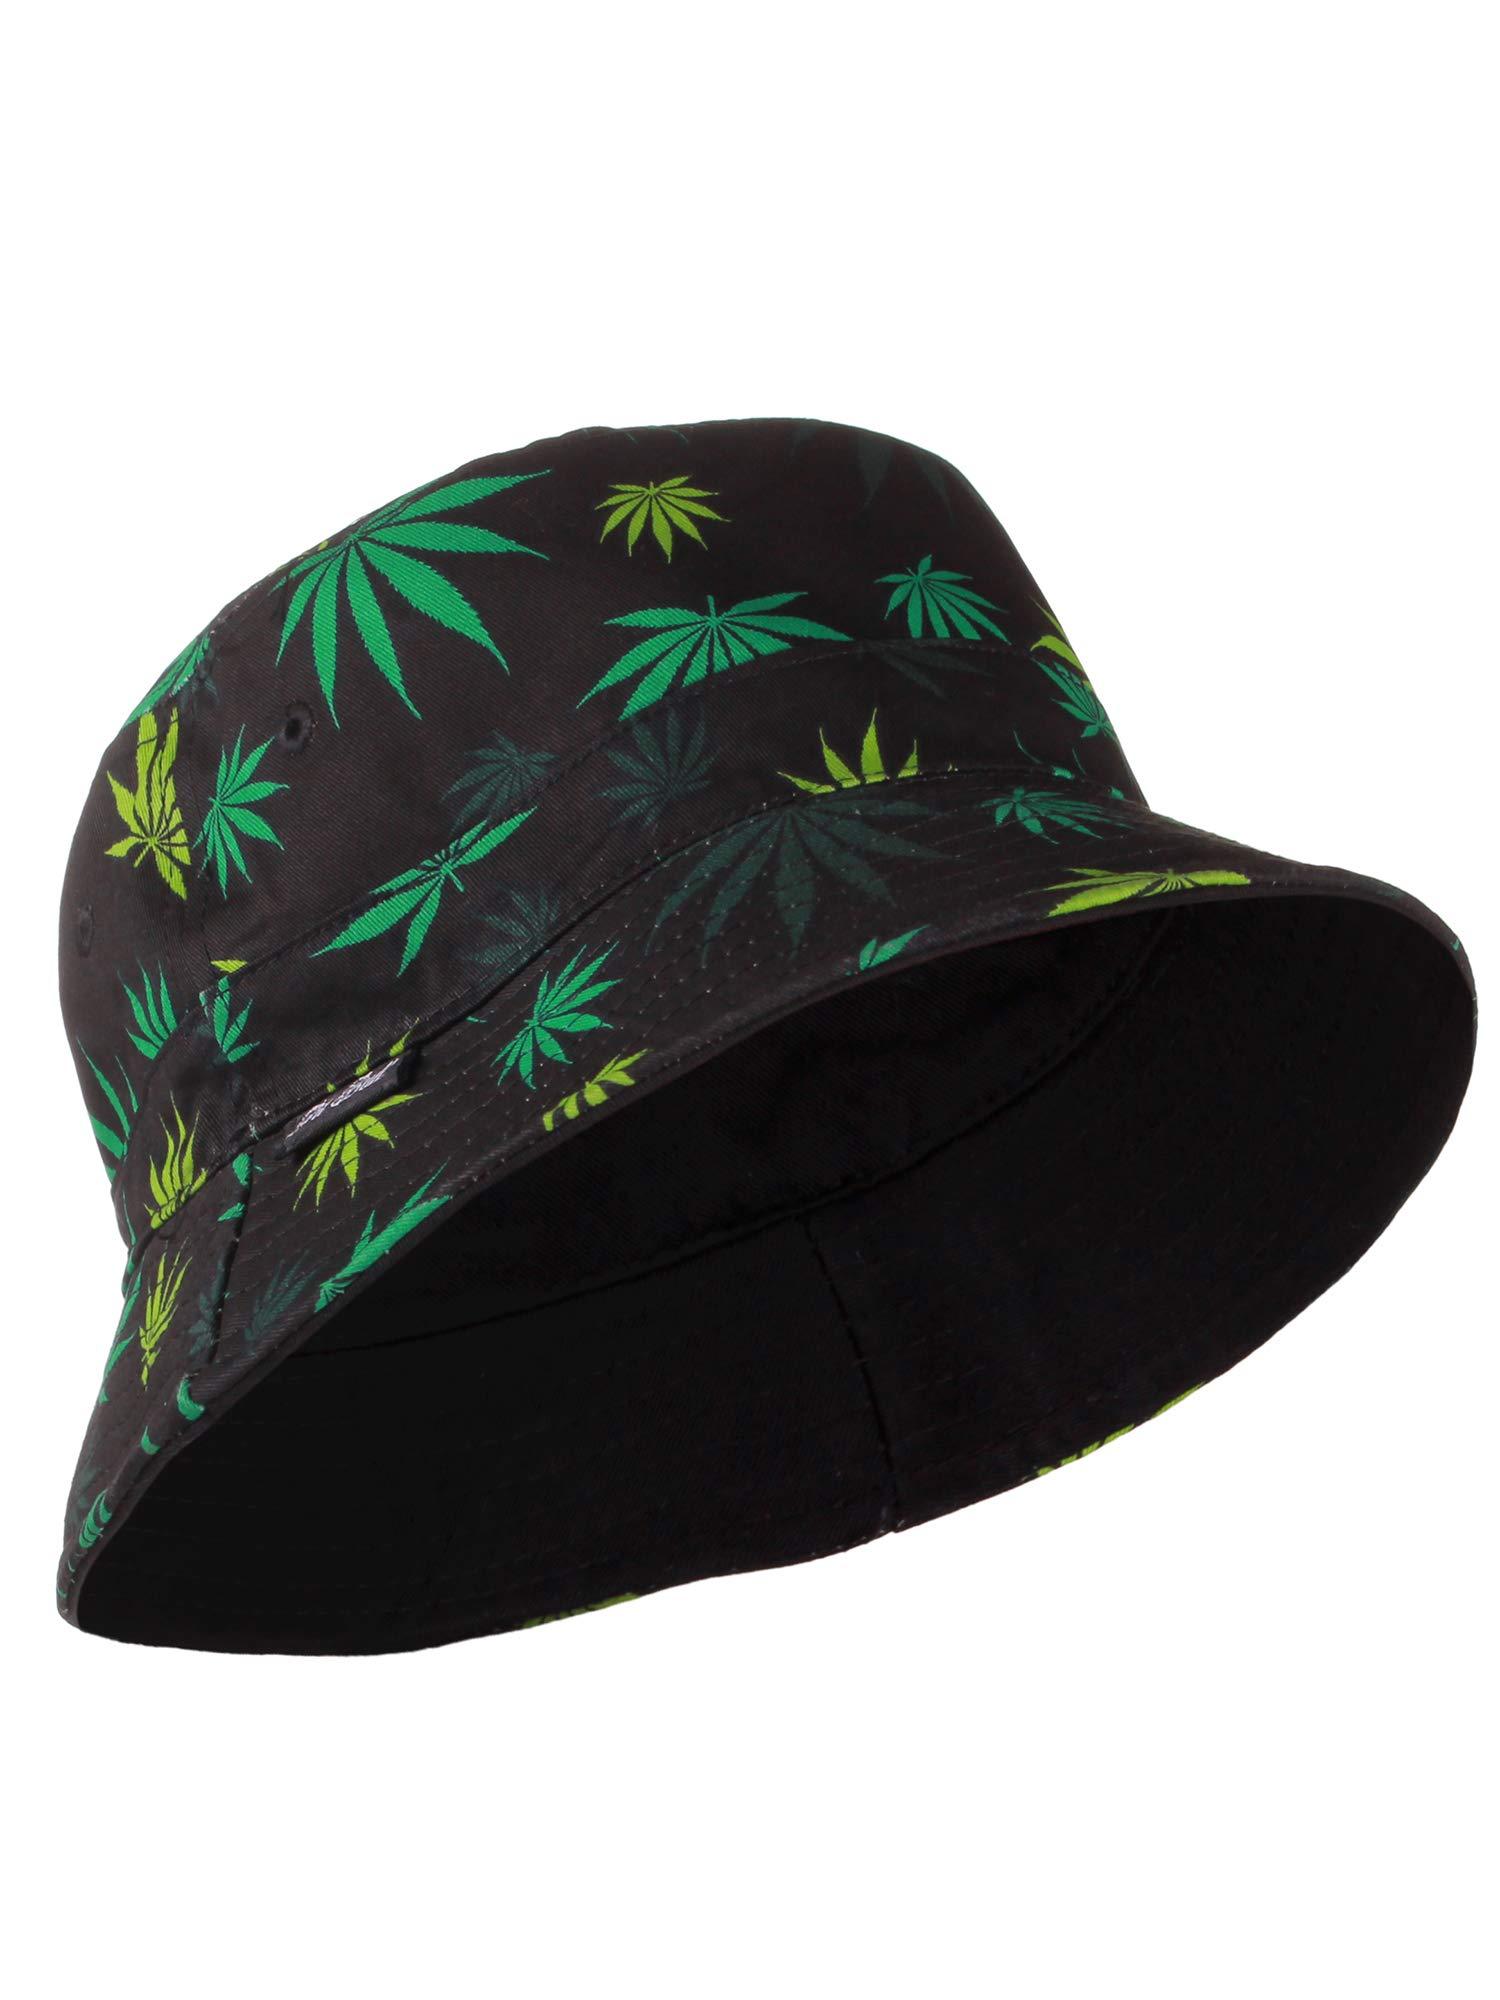 American Cities Fashion Bucket Hat Cap Headwear – Many Prints